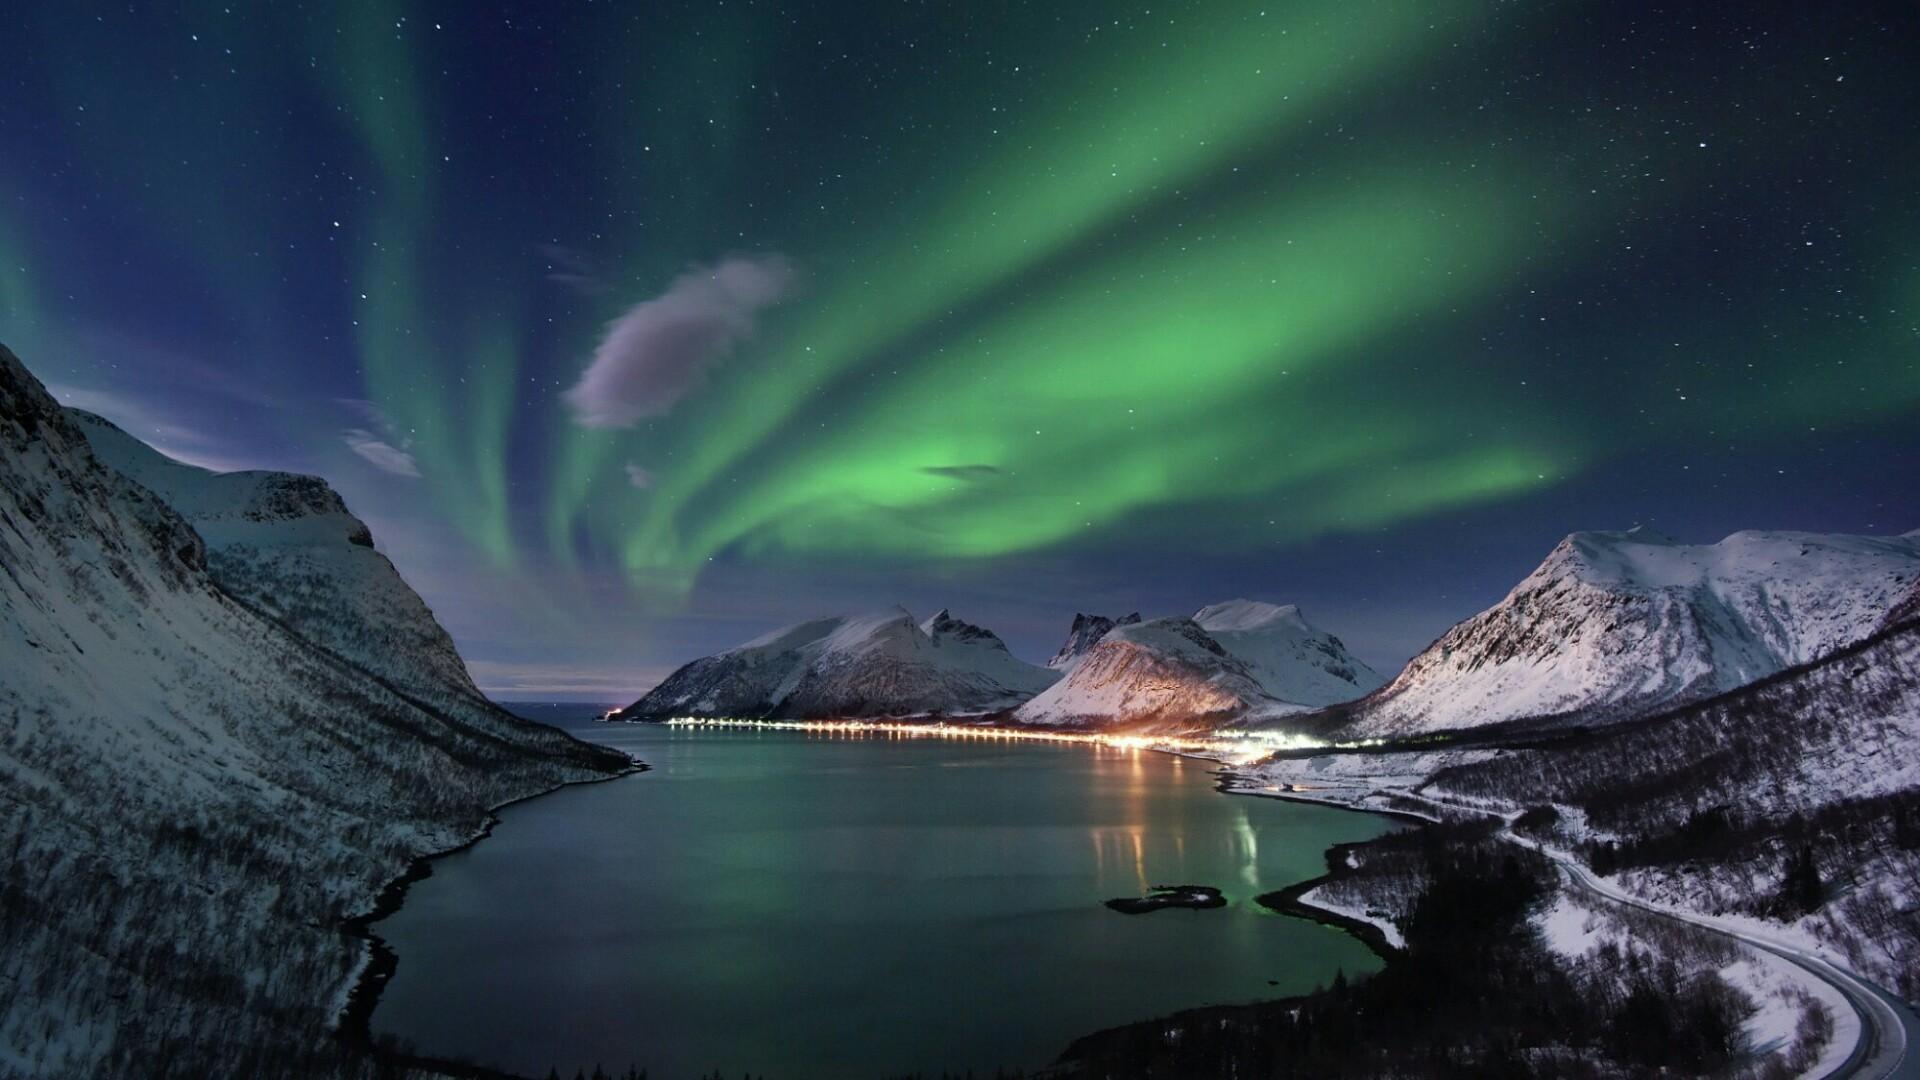 Northern Lights Wallpaper 72 Images